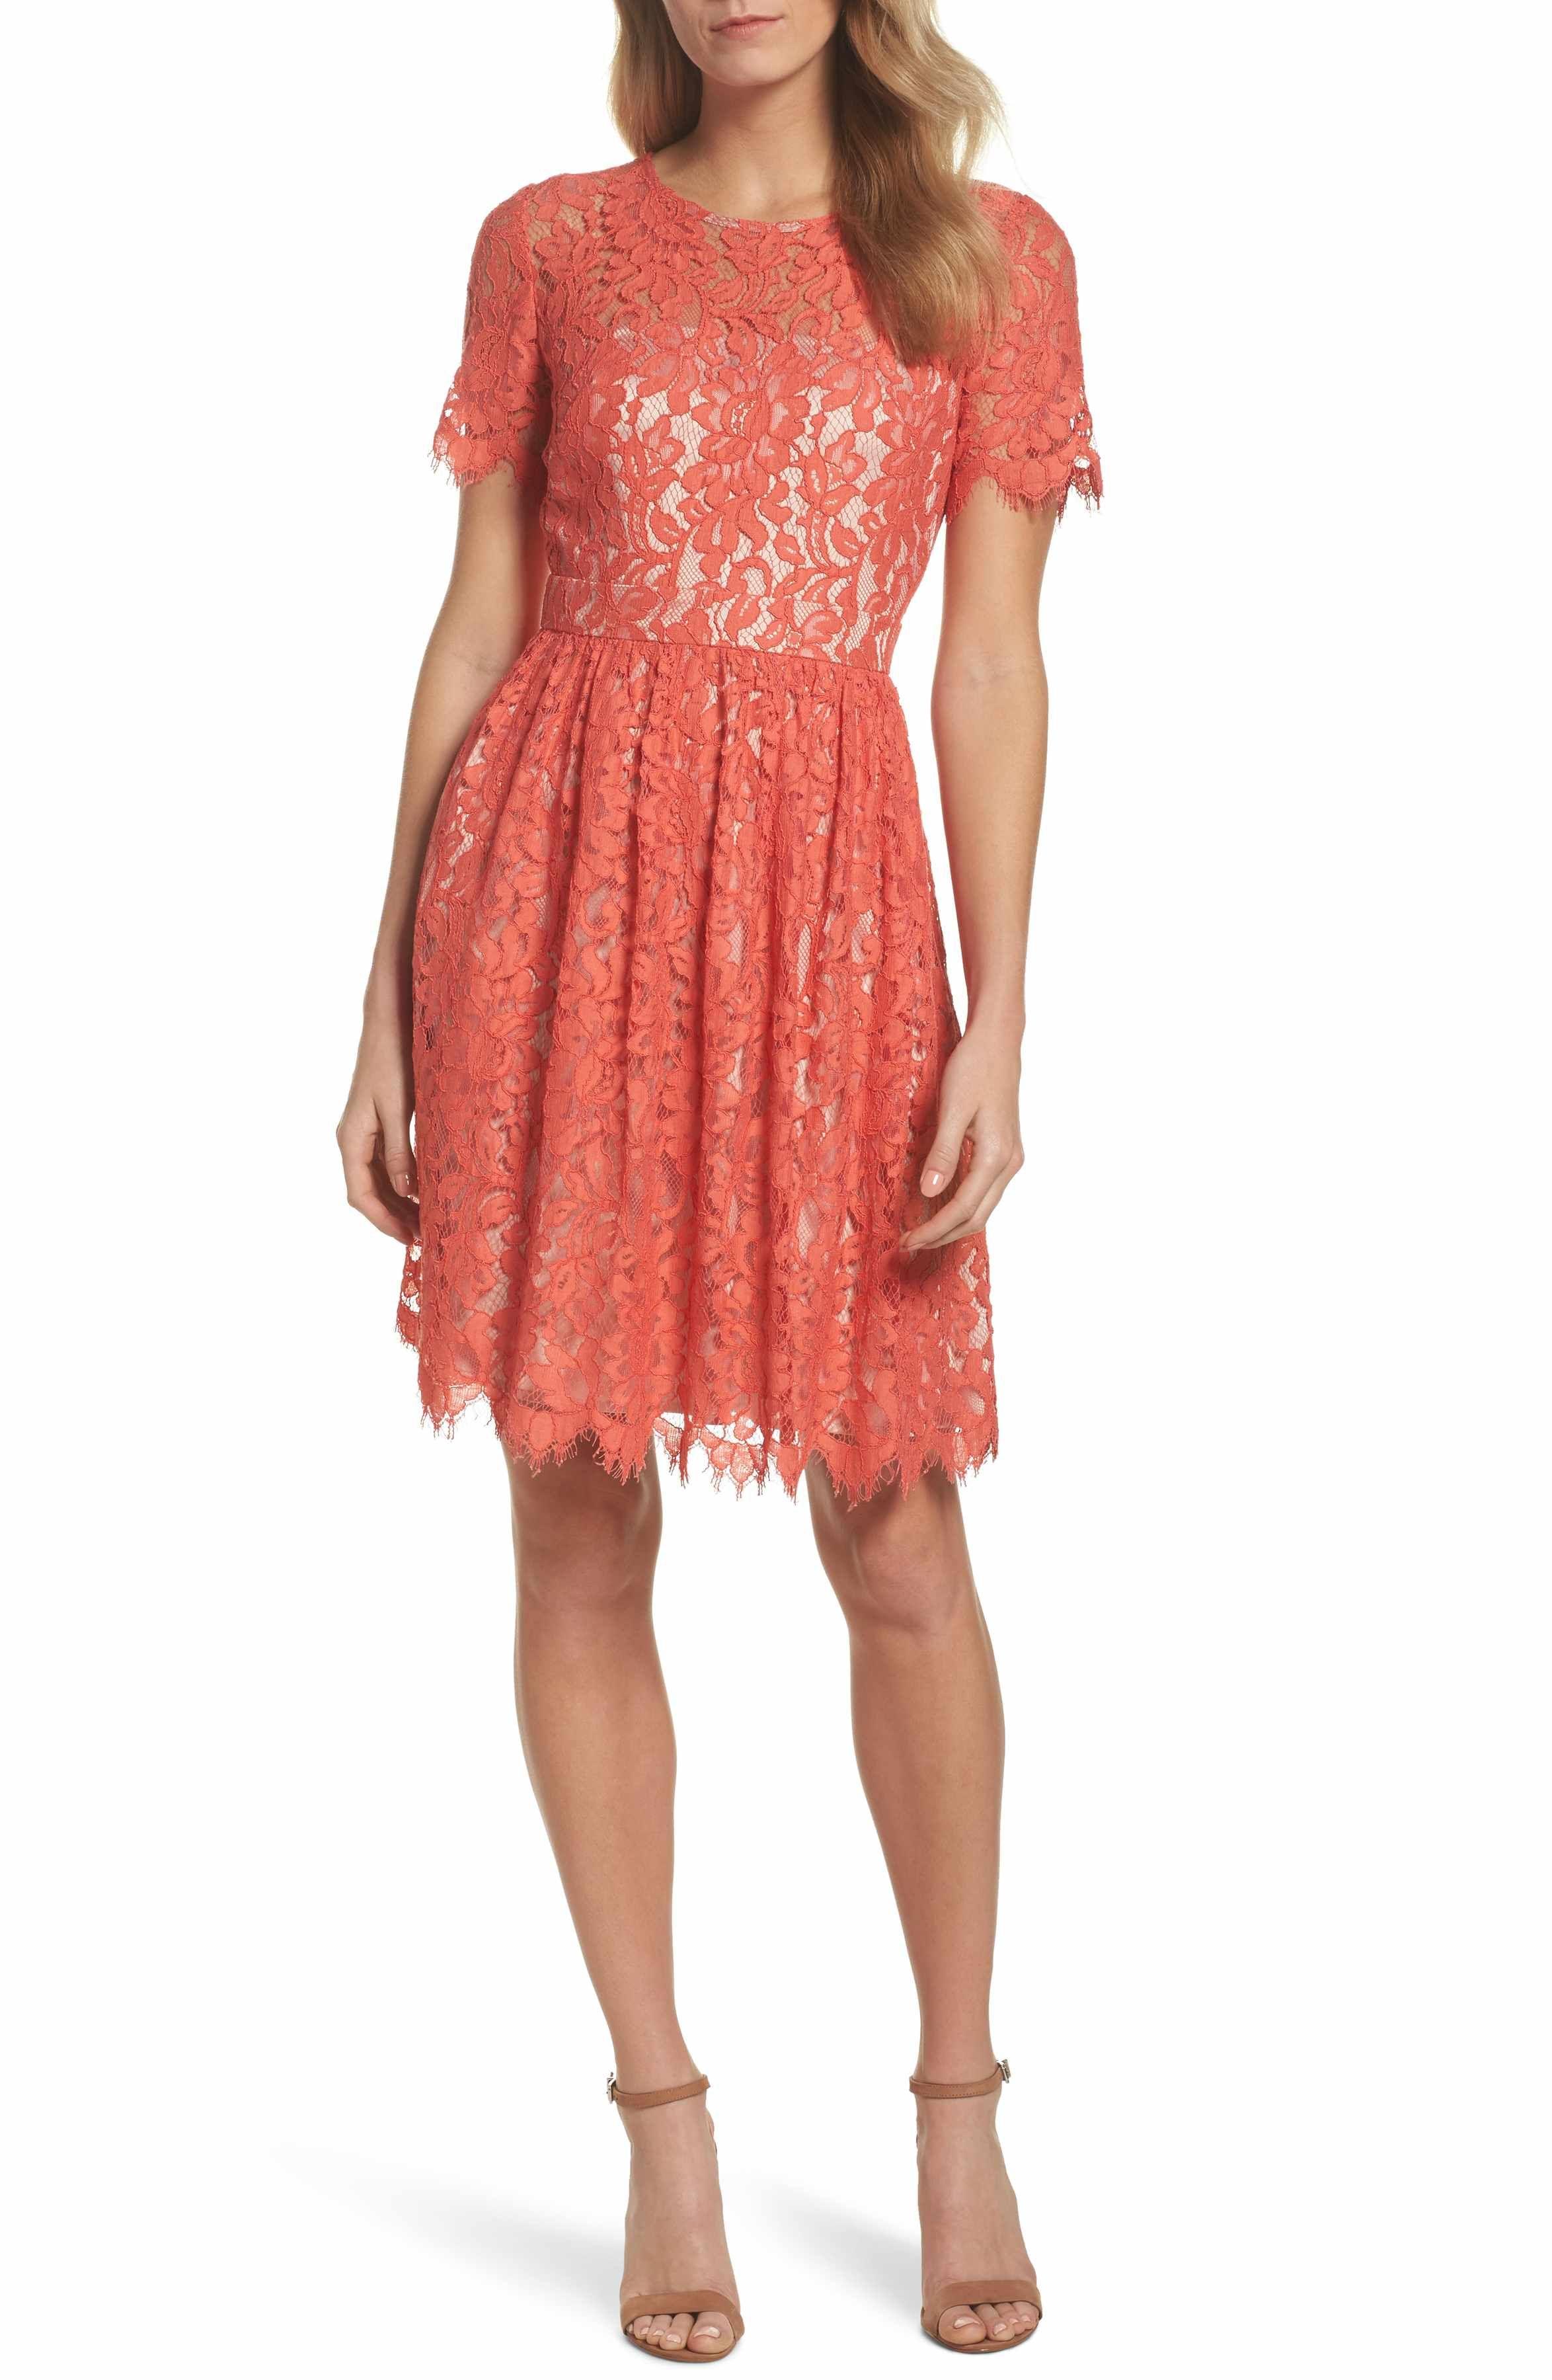 Eliza J Lace Fit Flare Dress Nordstrom Bridal Shower Outfit Wedding Guest Dress Fit Flare Dress [ 3600 x 2348 Pixel ]